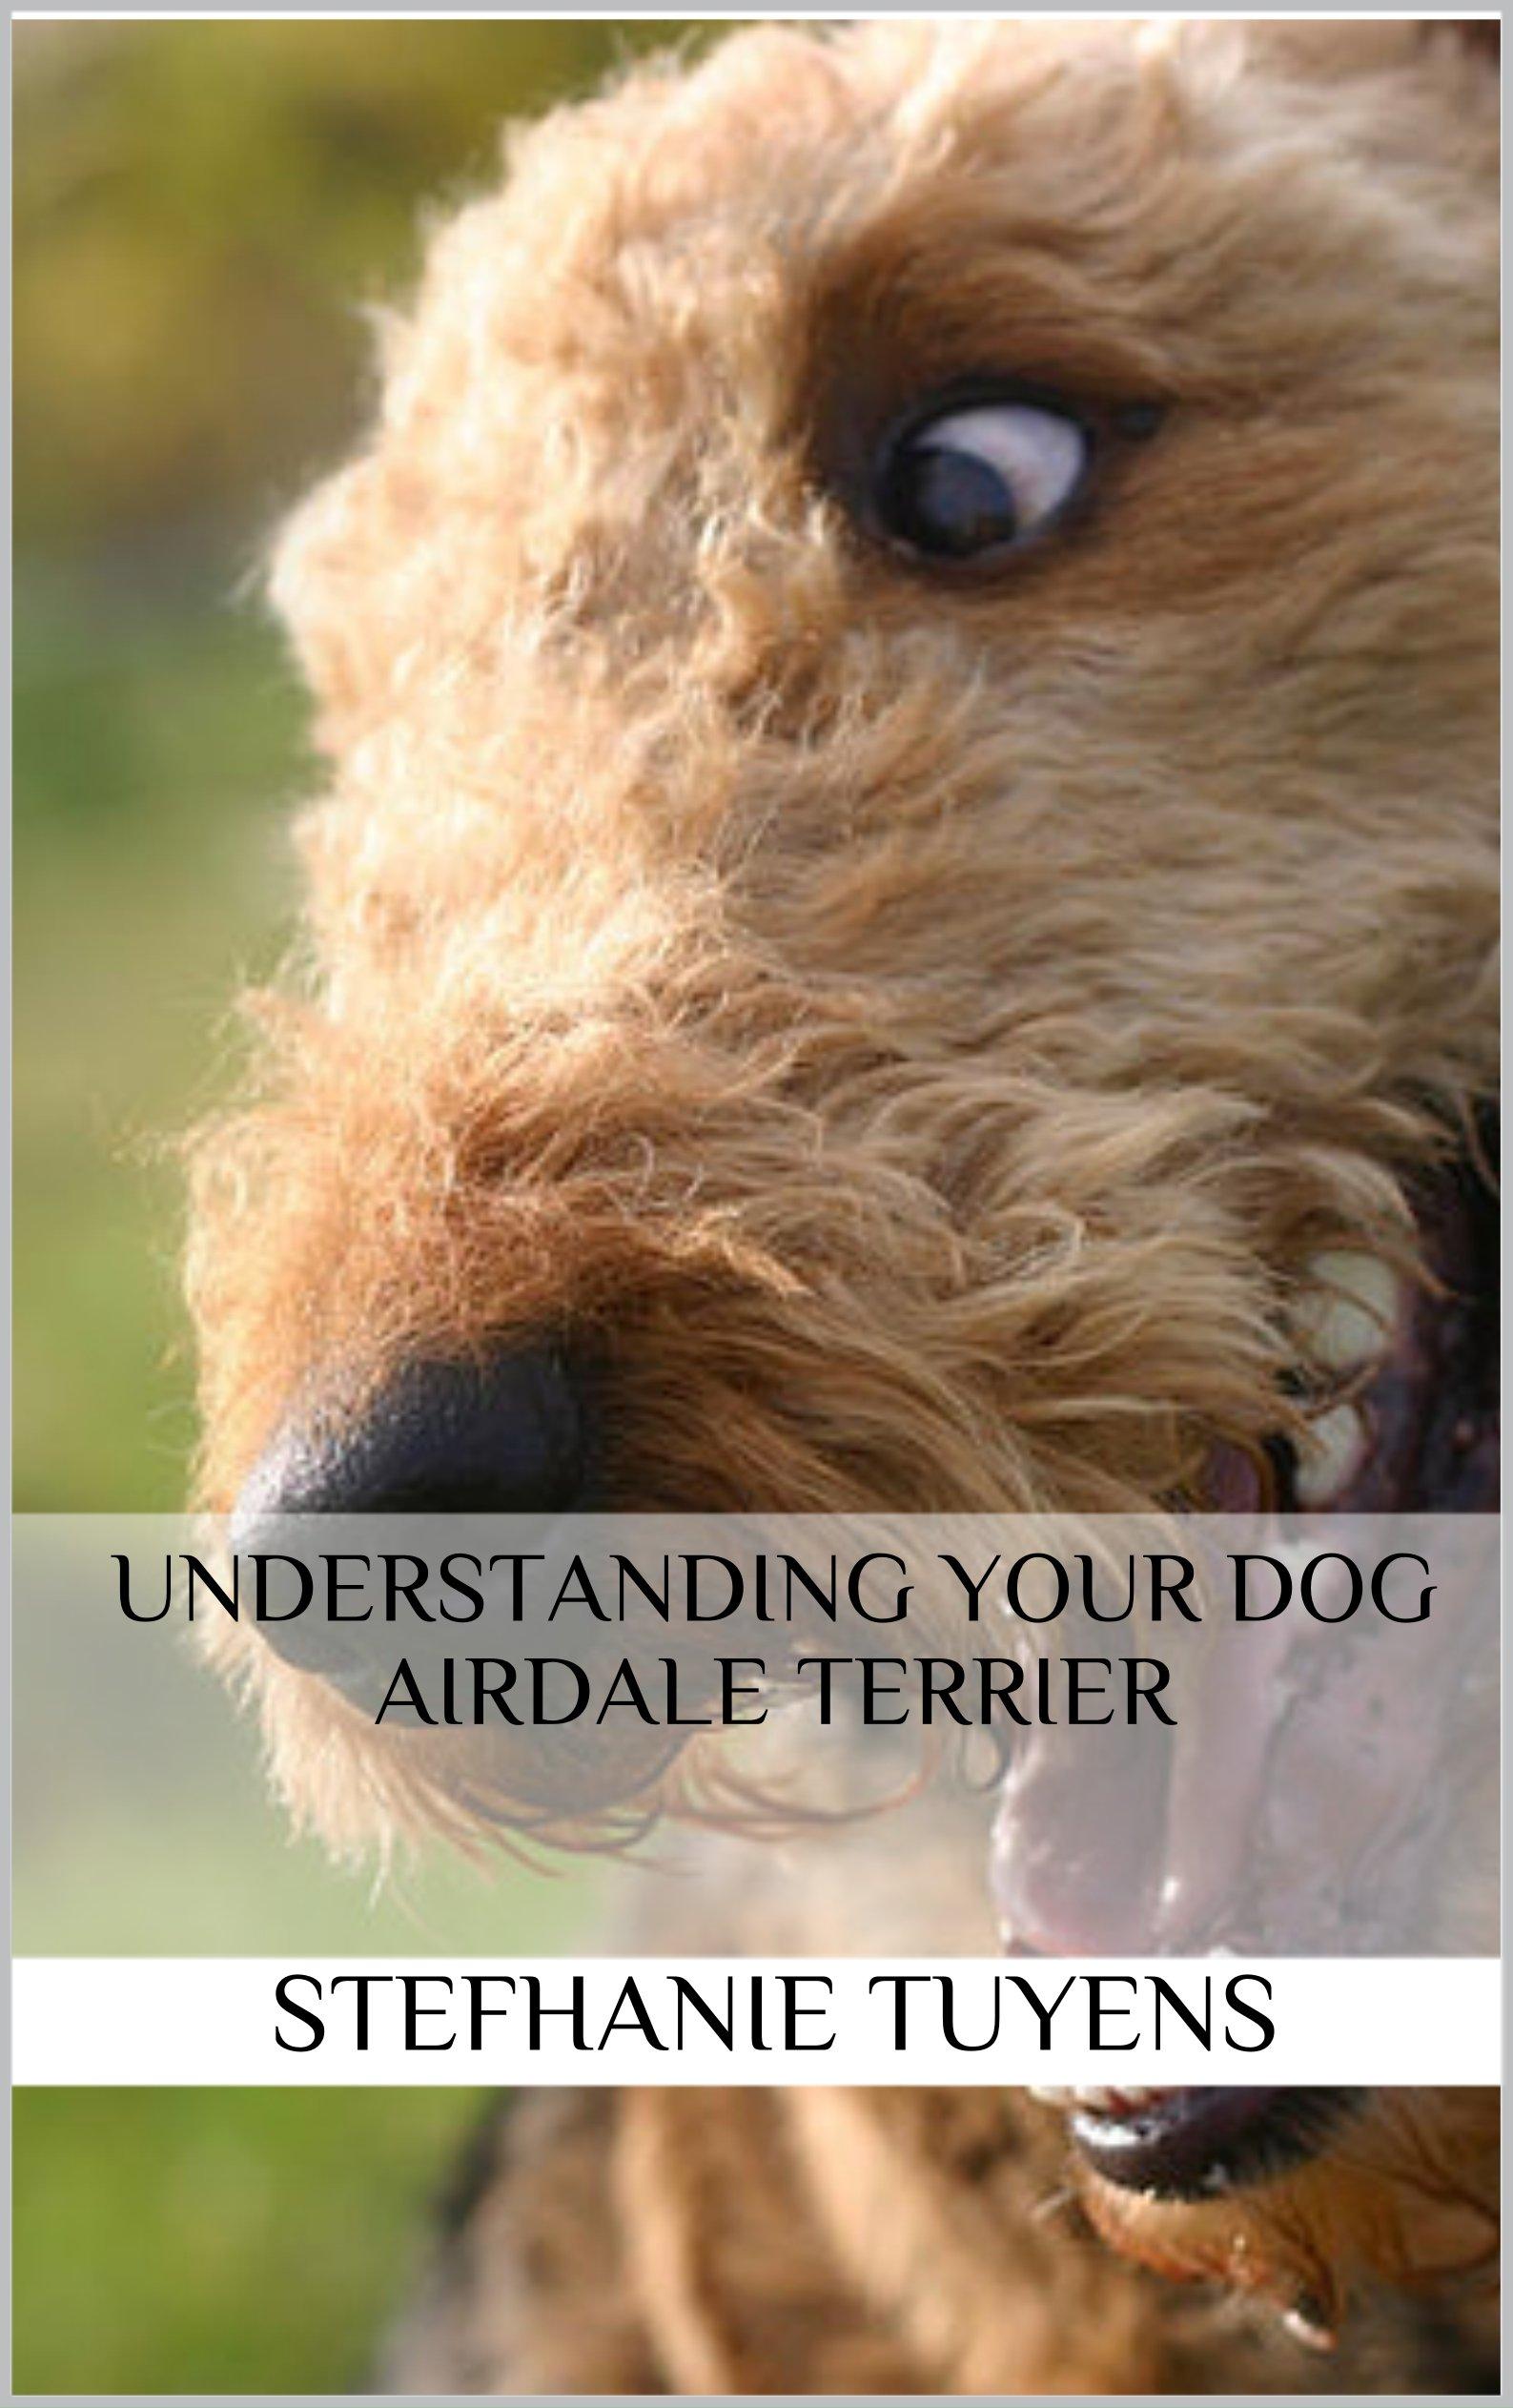 Understanding Your Dog Airdale Terrier